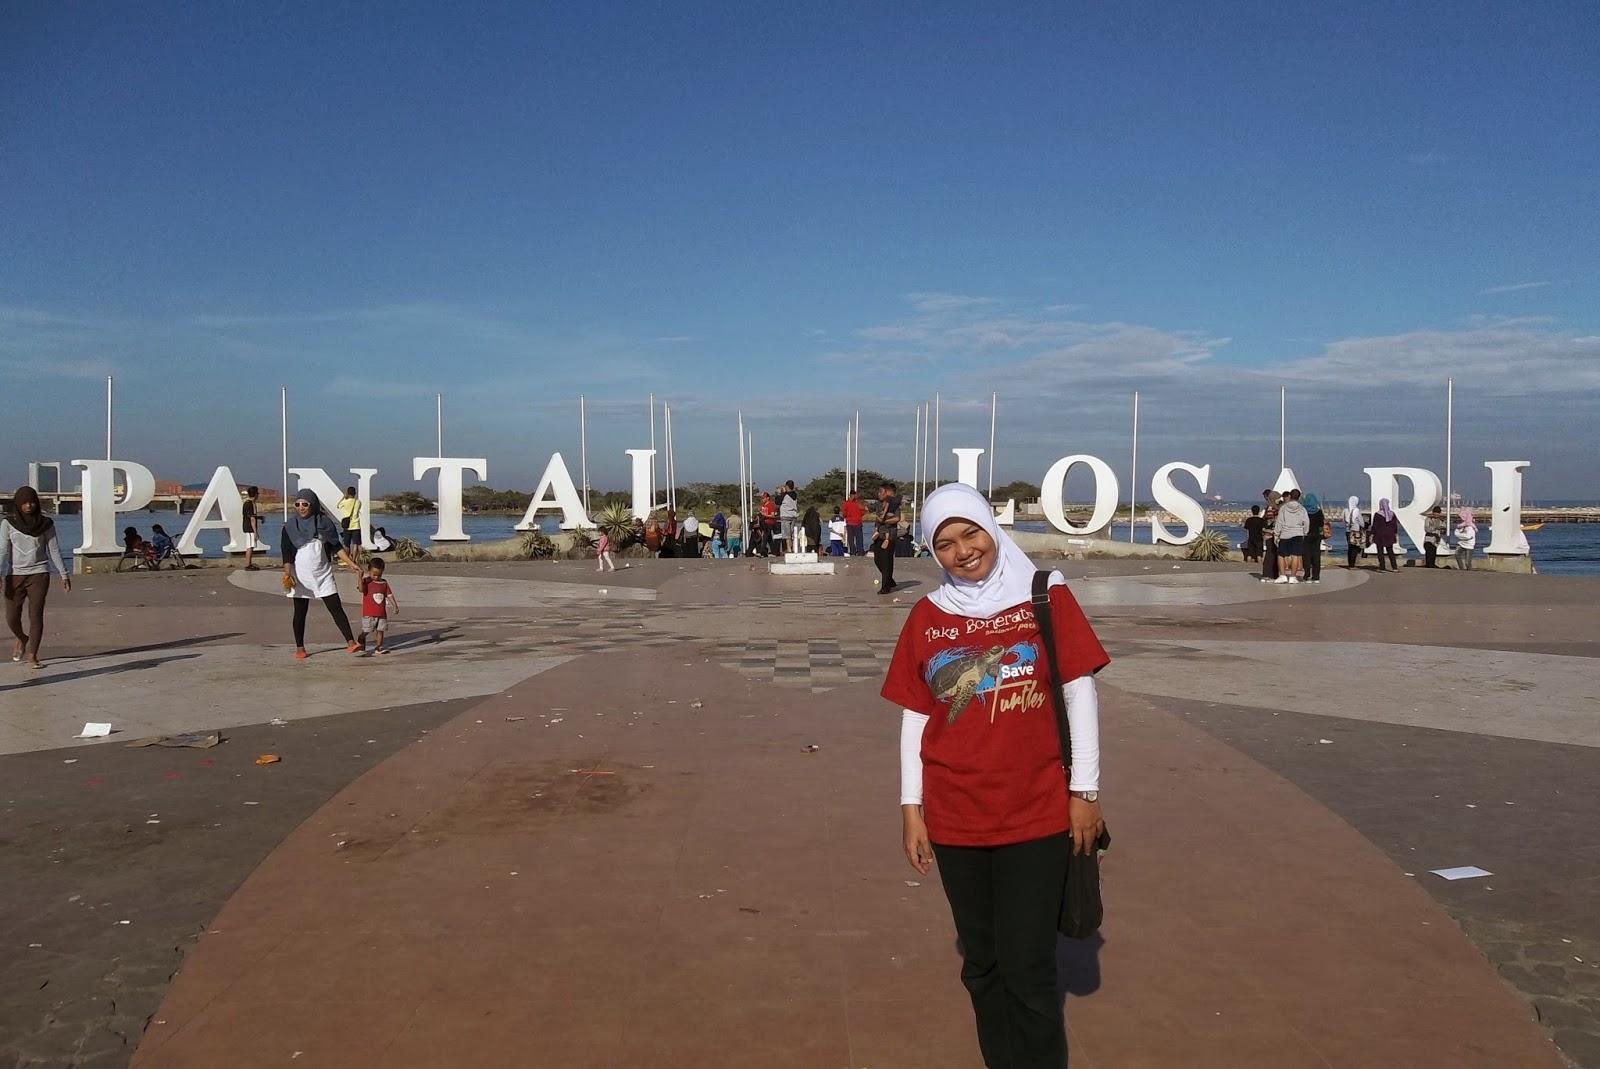 Kemana Kaki Melangkah Makassar Ikon Kota Model Tidak Termasuk Pantai